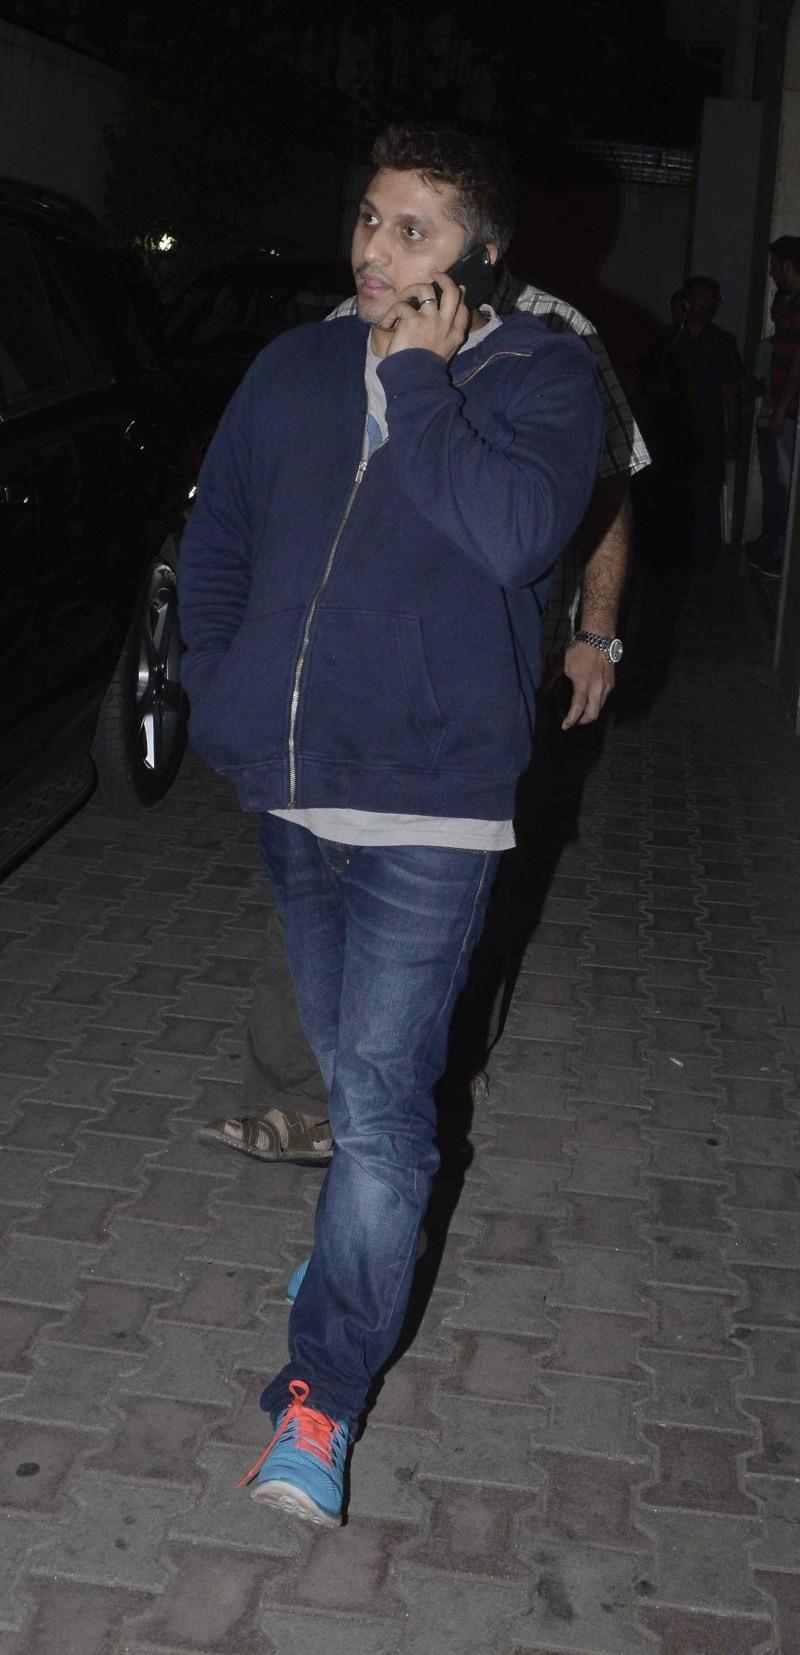 Sidharth Malhotra And Alia Bhatt Spotted At Santacruz,Sidharth Malhotra,Alia Bhatt,Sidharth Malhotra and Alia Bhatt,actress Alia Bhatt